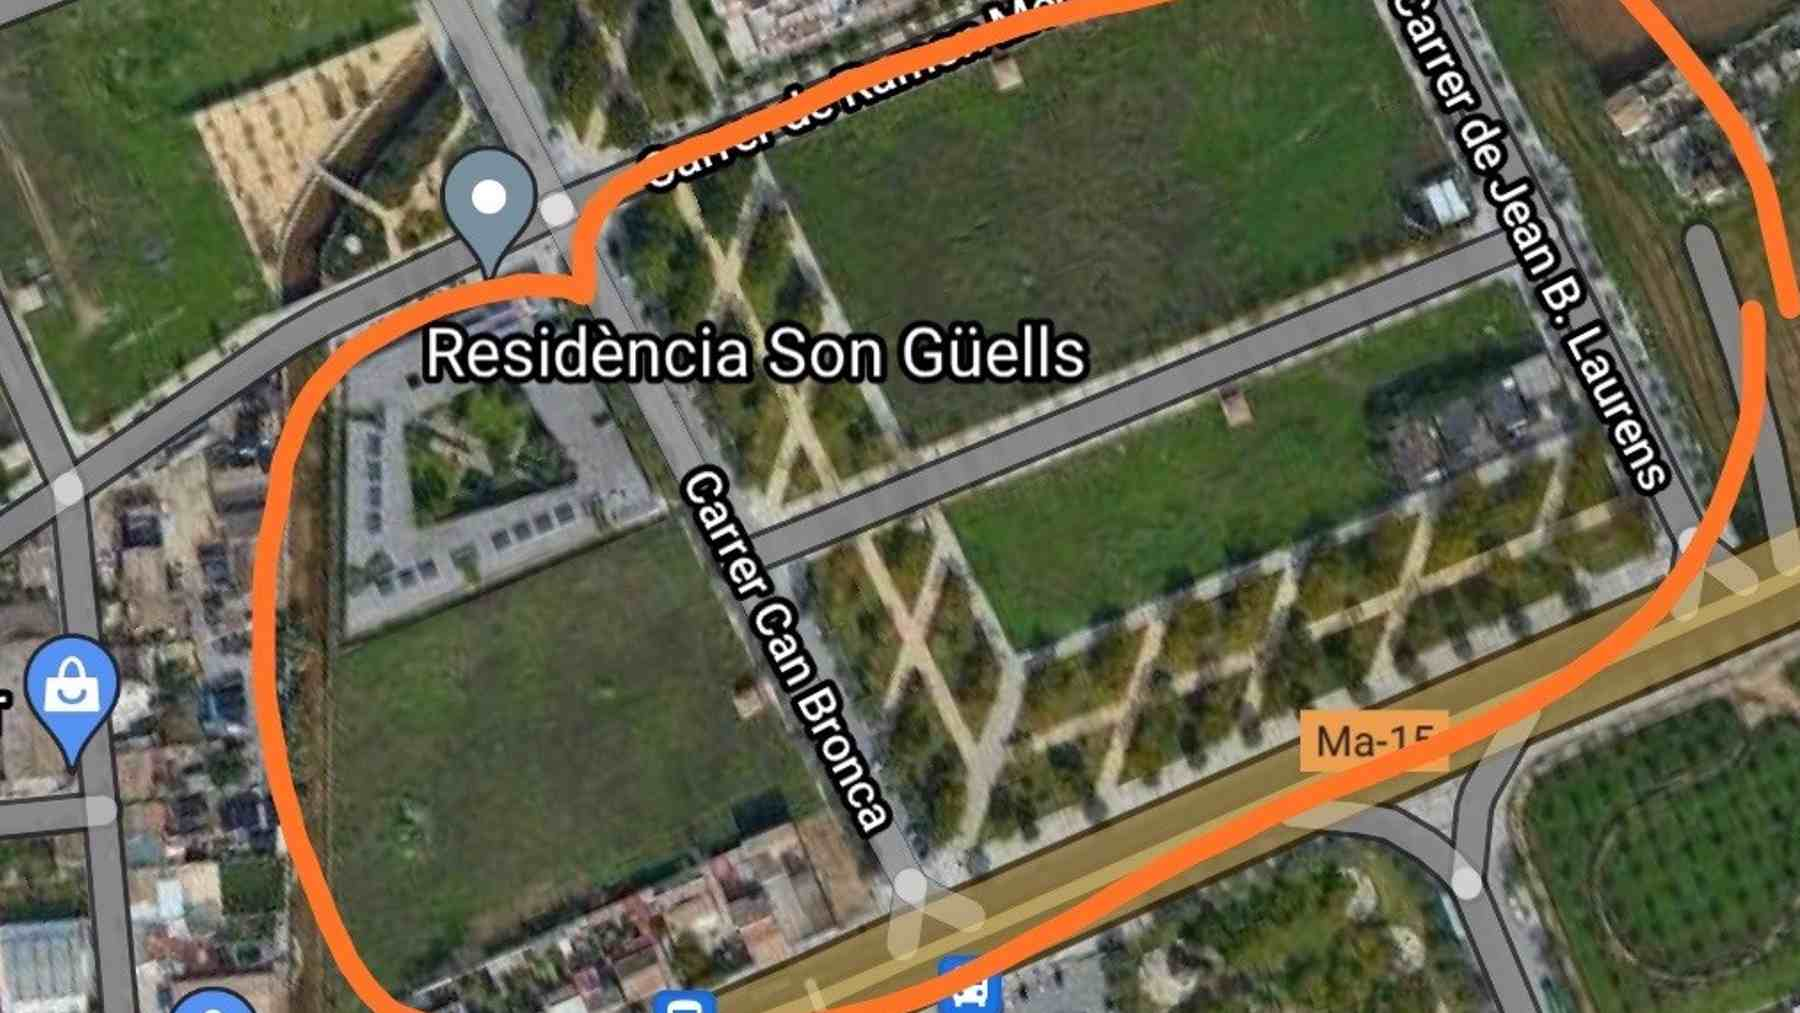 Terrenos a edificar en el barrio de Son Güells en Palma